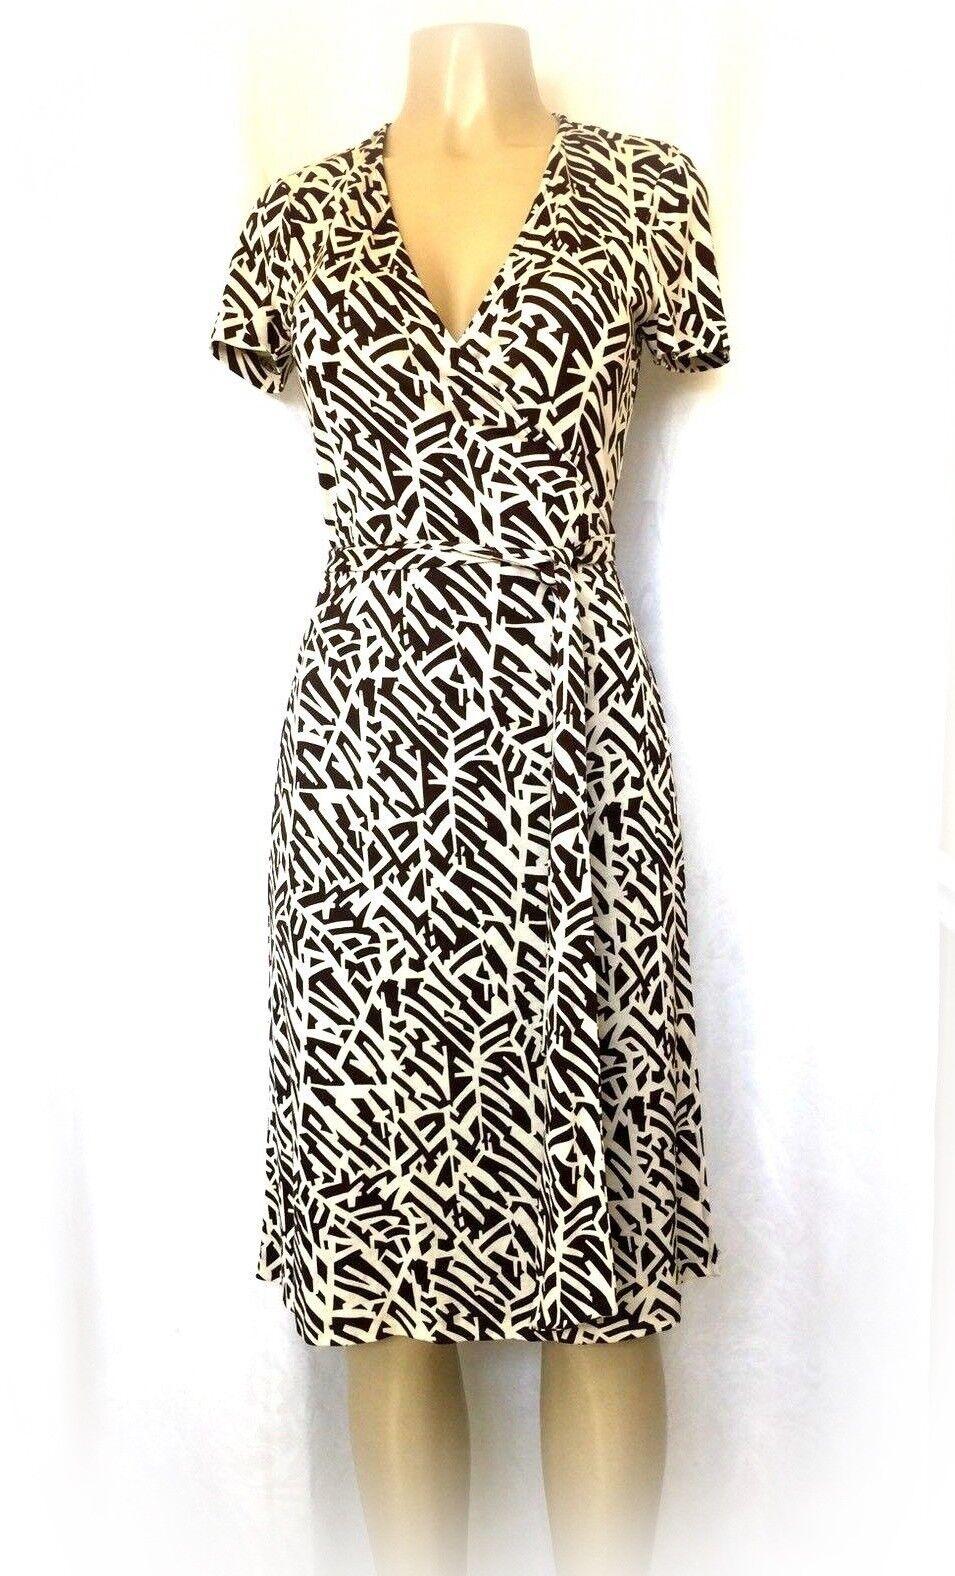 DVF Diane Von Furstenberg Furstenberg Furstenberg Jenny True WRAP DRESS Cream Brown Silk Short sleeve 6 c407ed